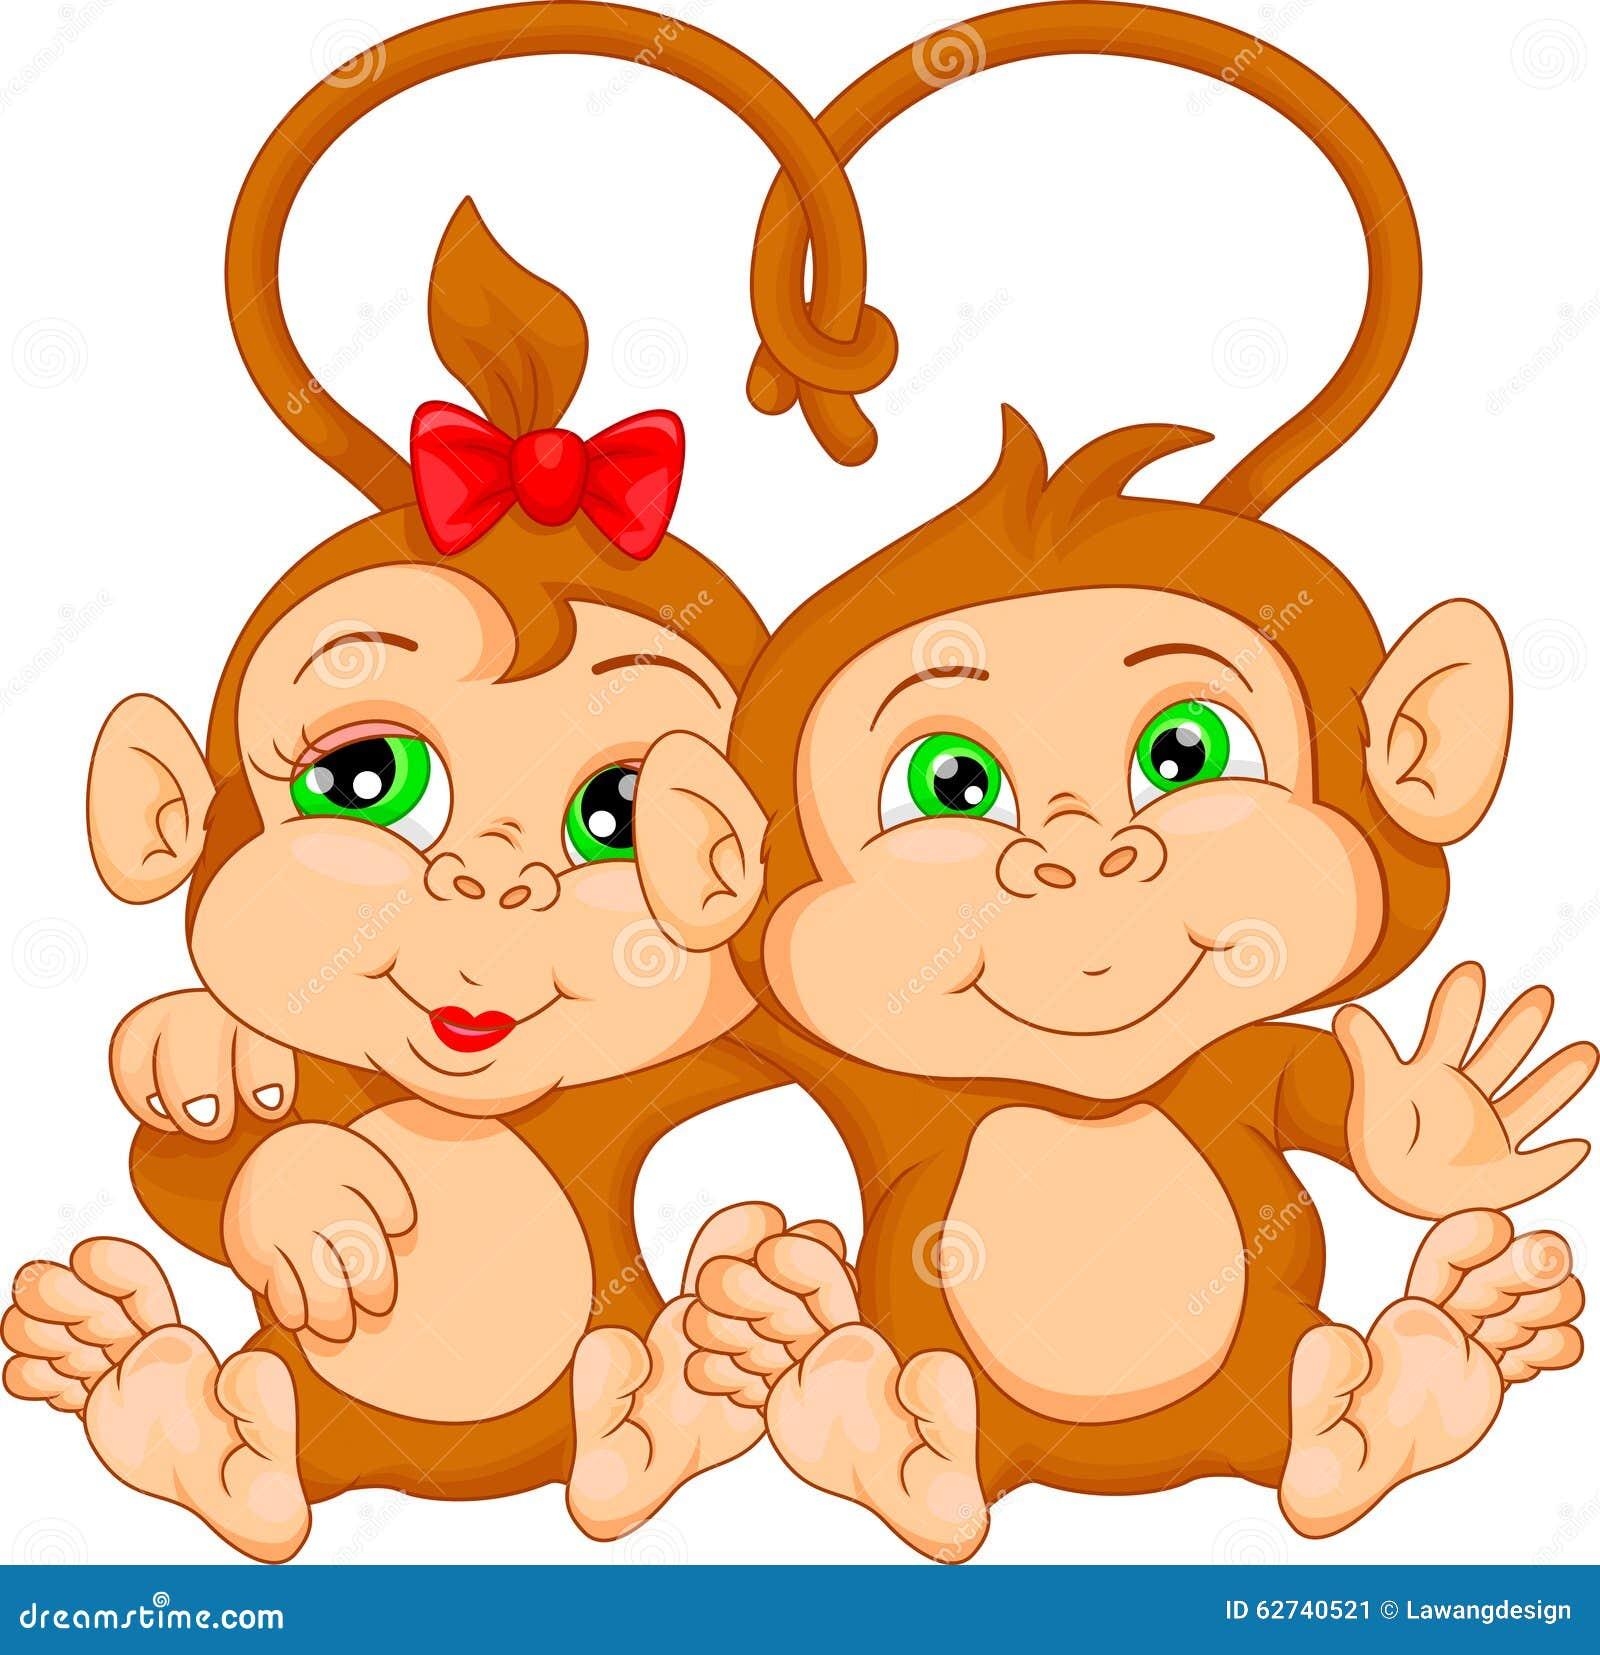 Cute Monkey Couple Cartoon Stock Vector - Image: 62740521